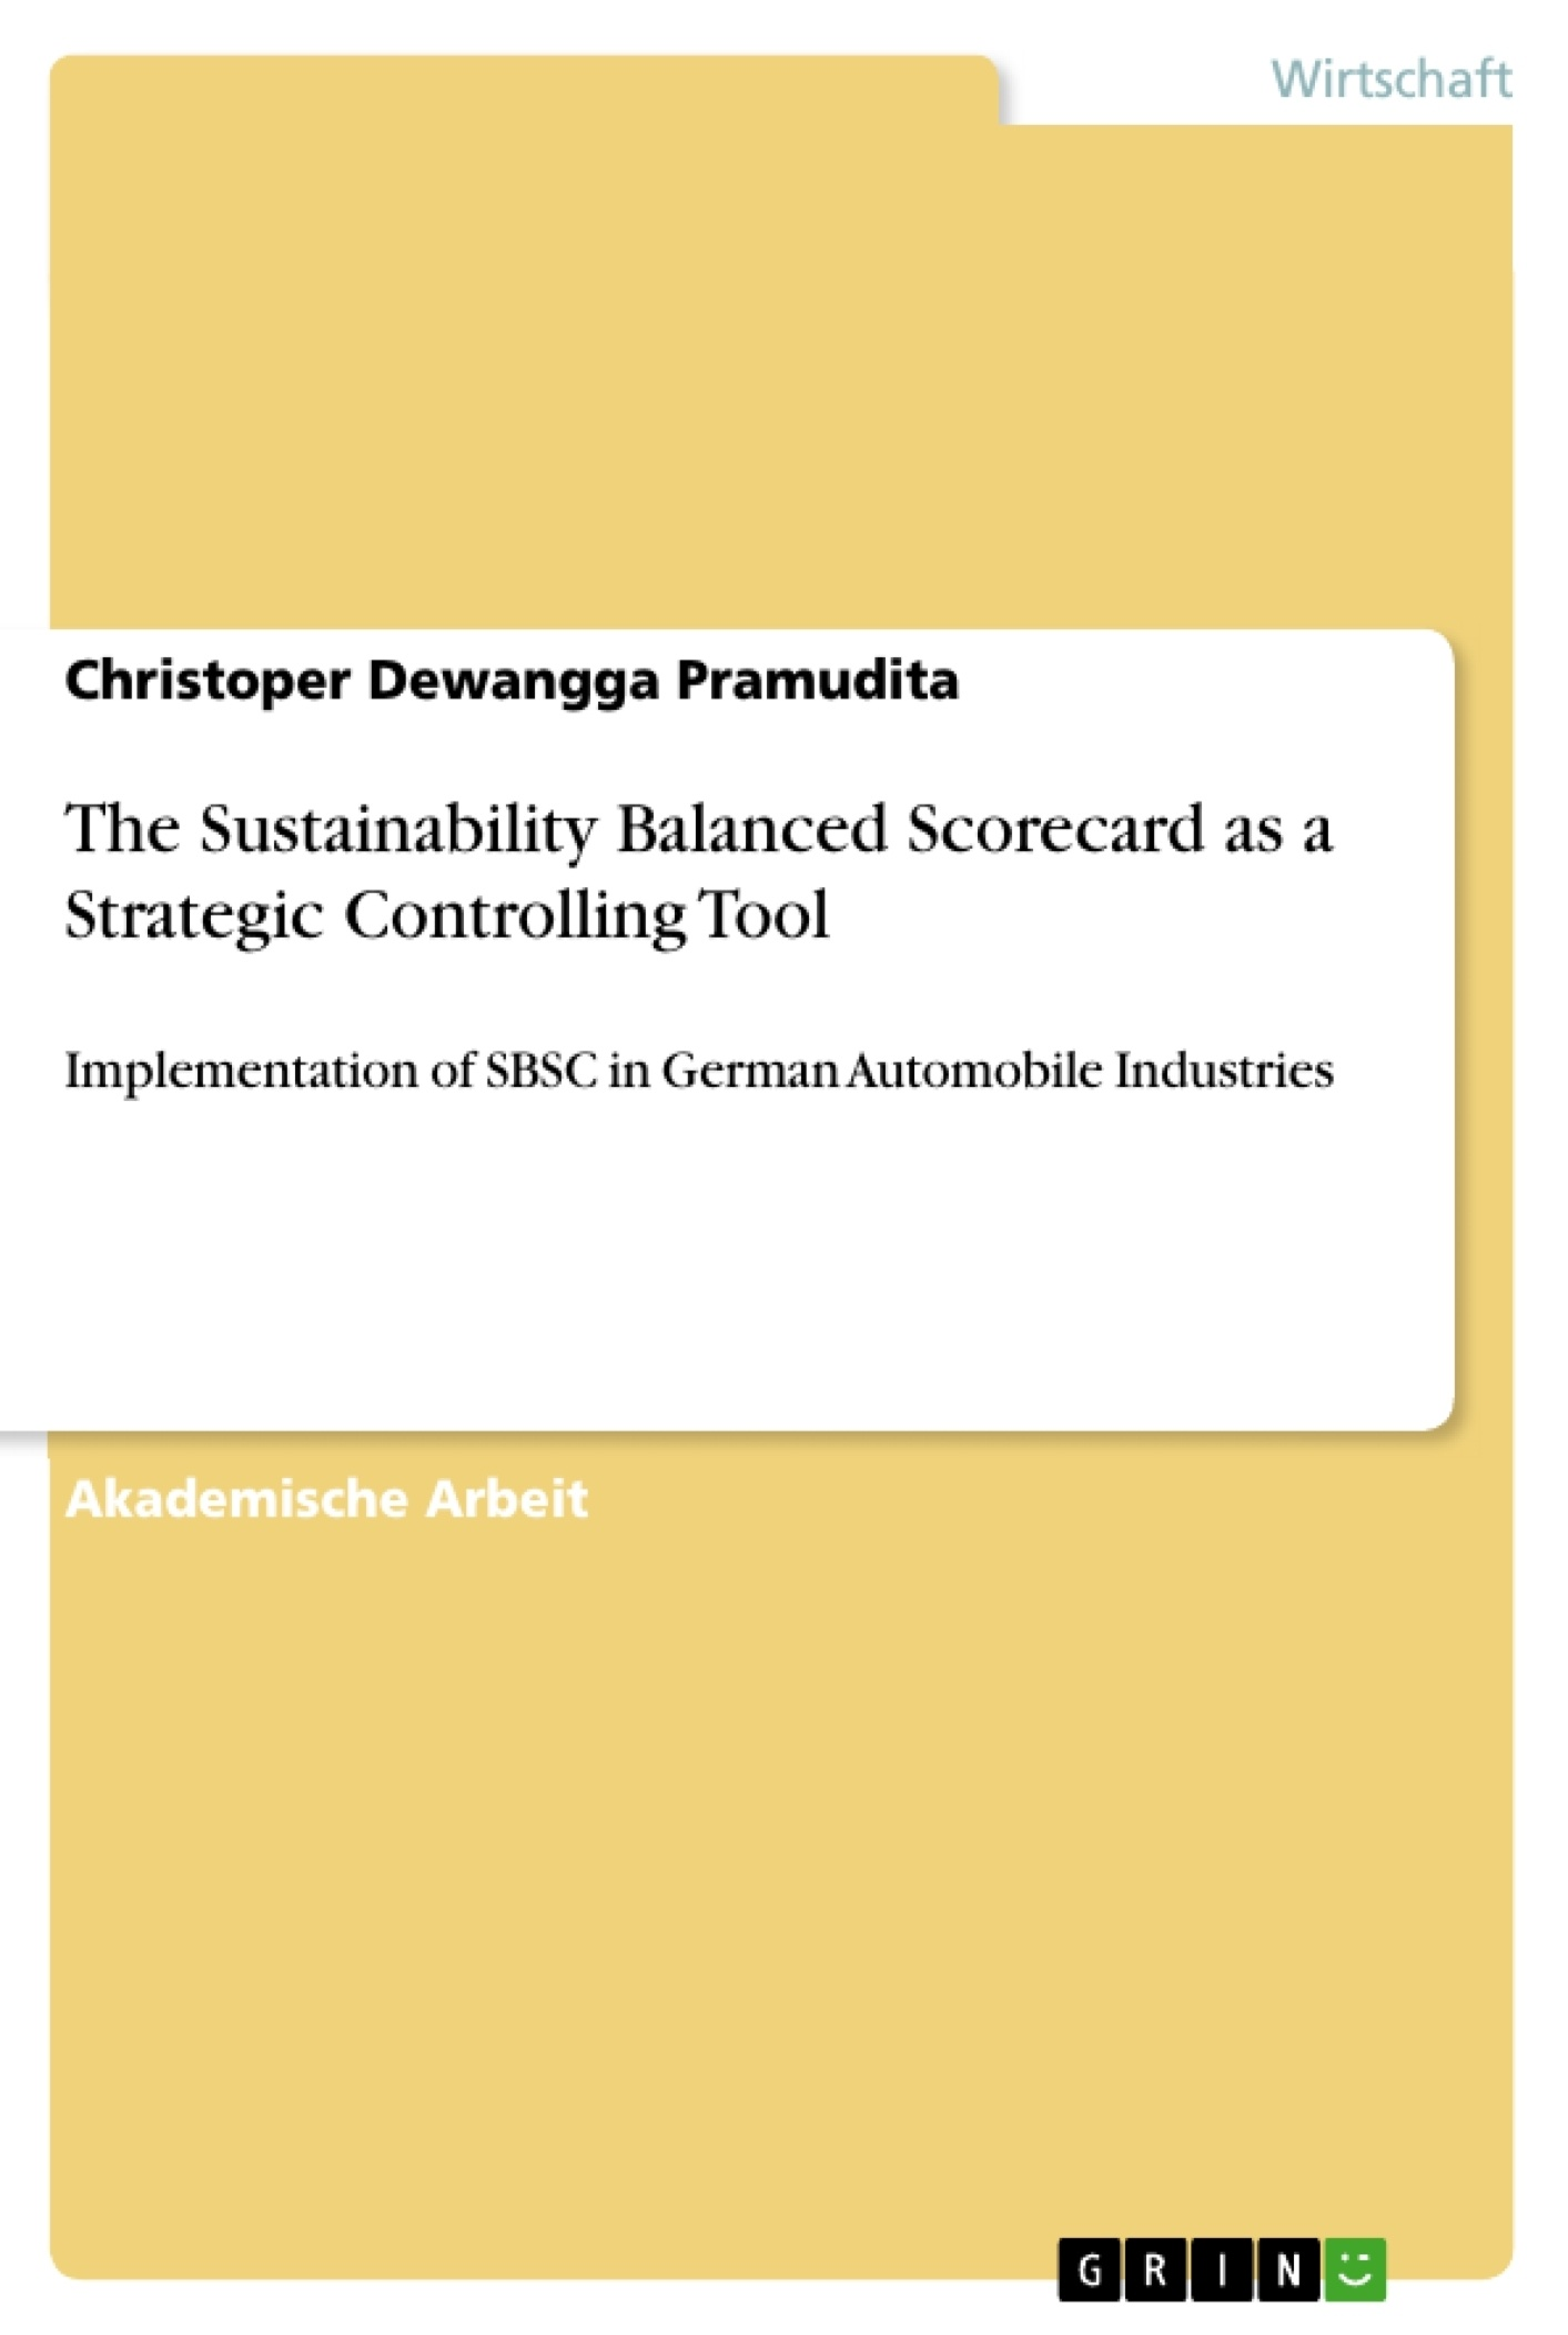 Titel: The Sustainability Balanced Scorecard as a Strategic Controlling Tool